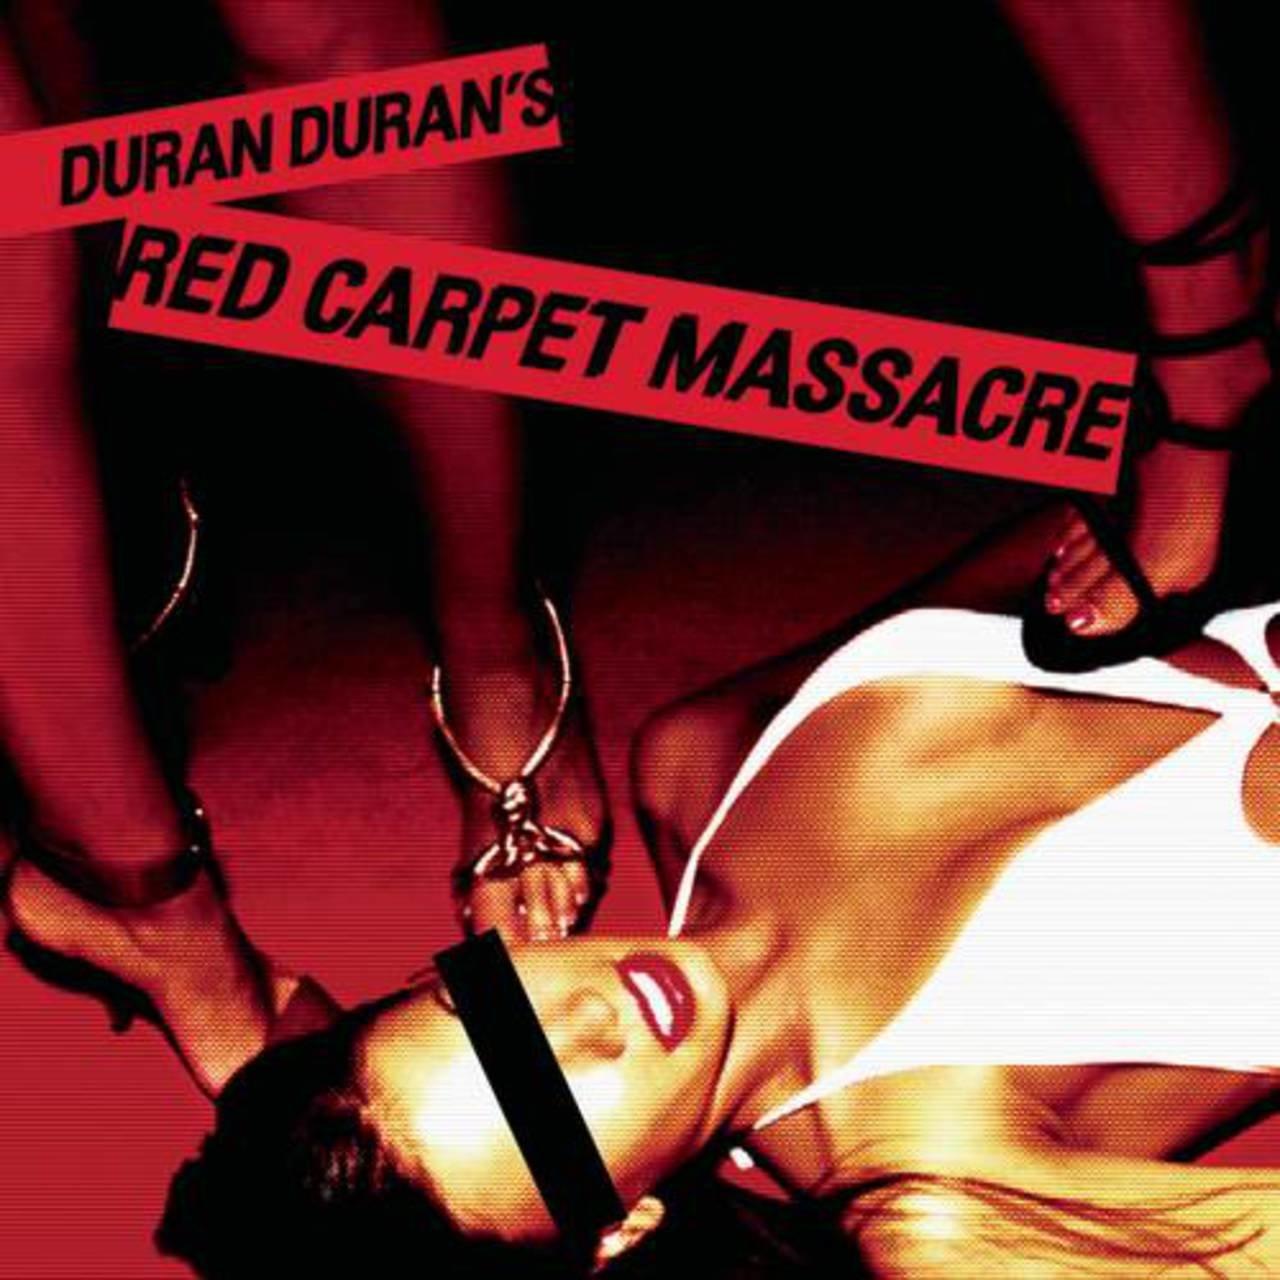 Red Carpet Massacre Duran Duran. Astronaut   Duran Duran TIDAL